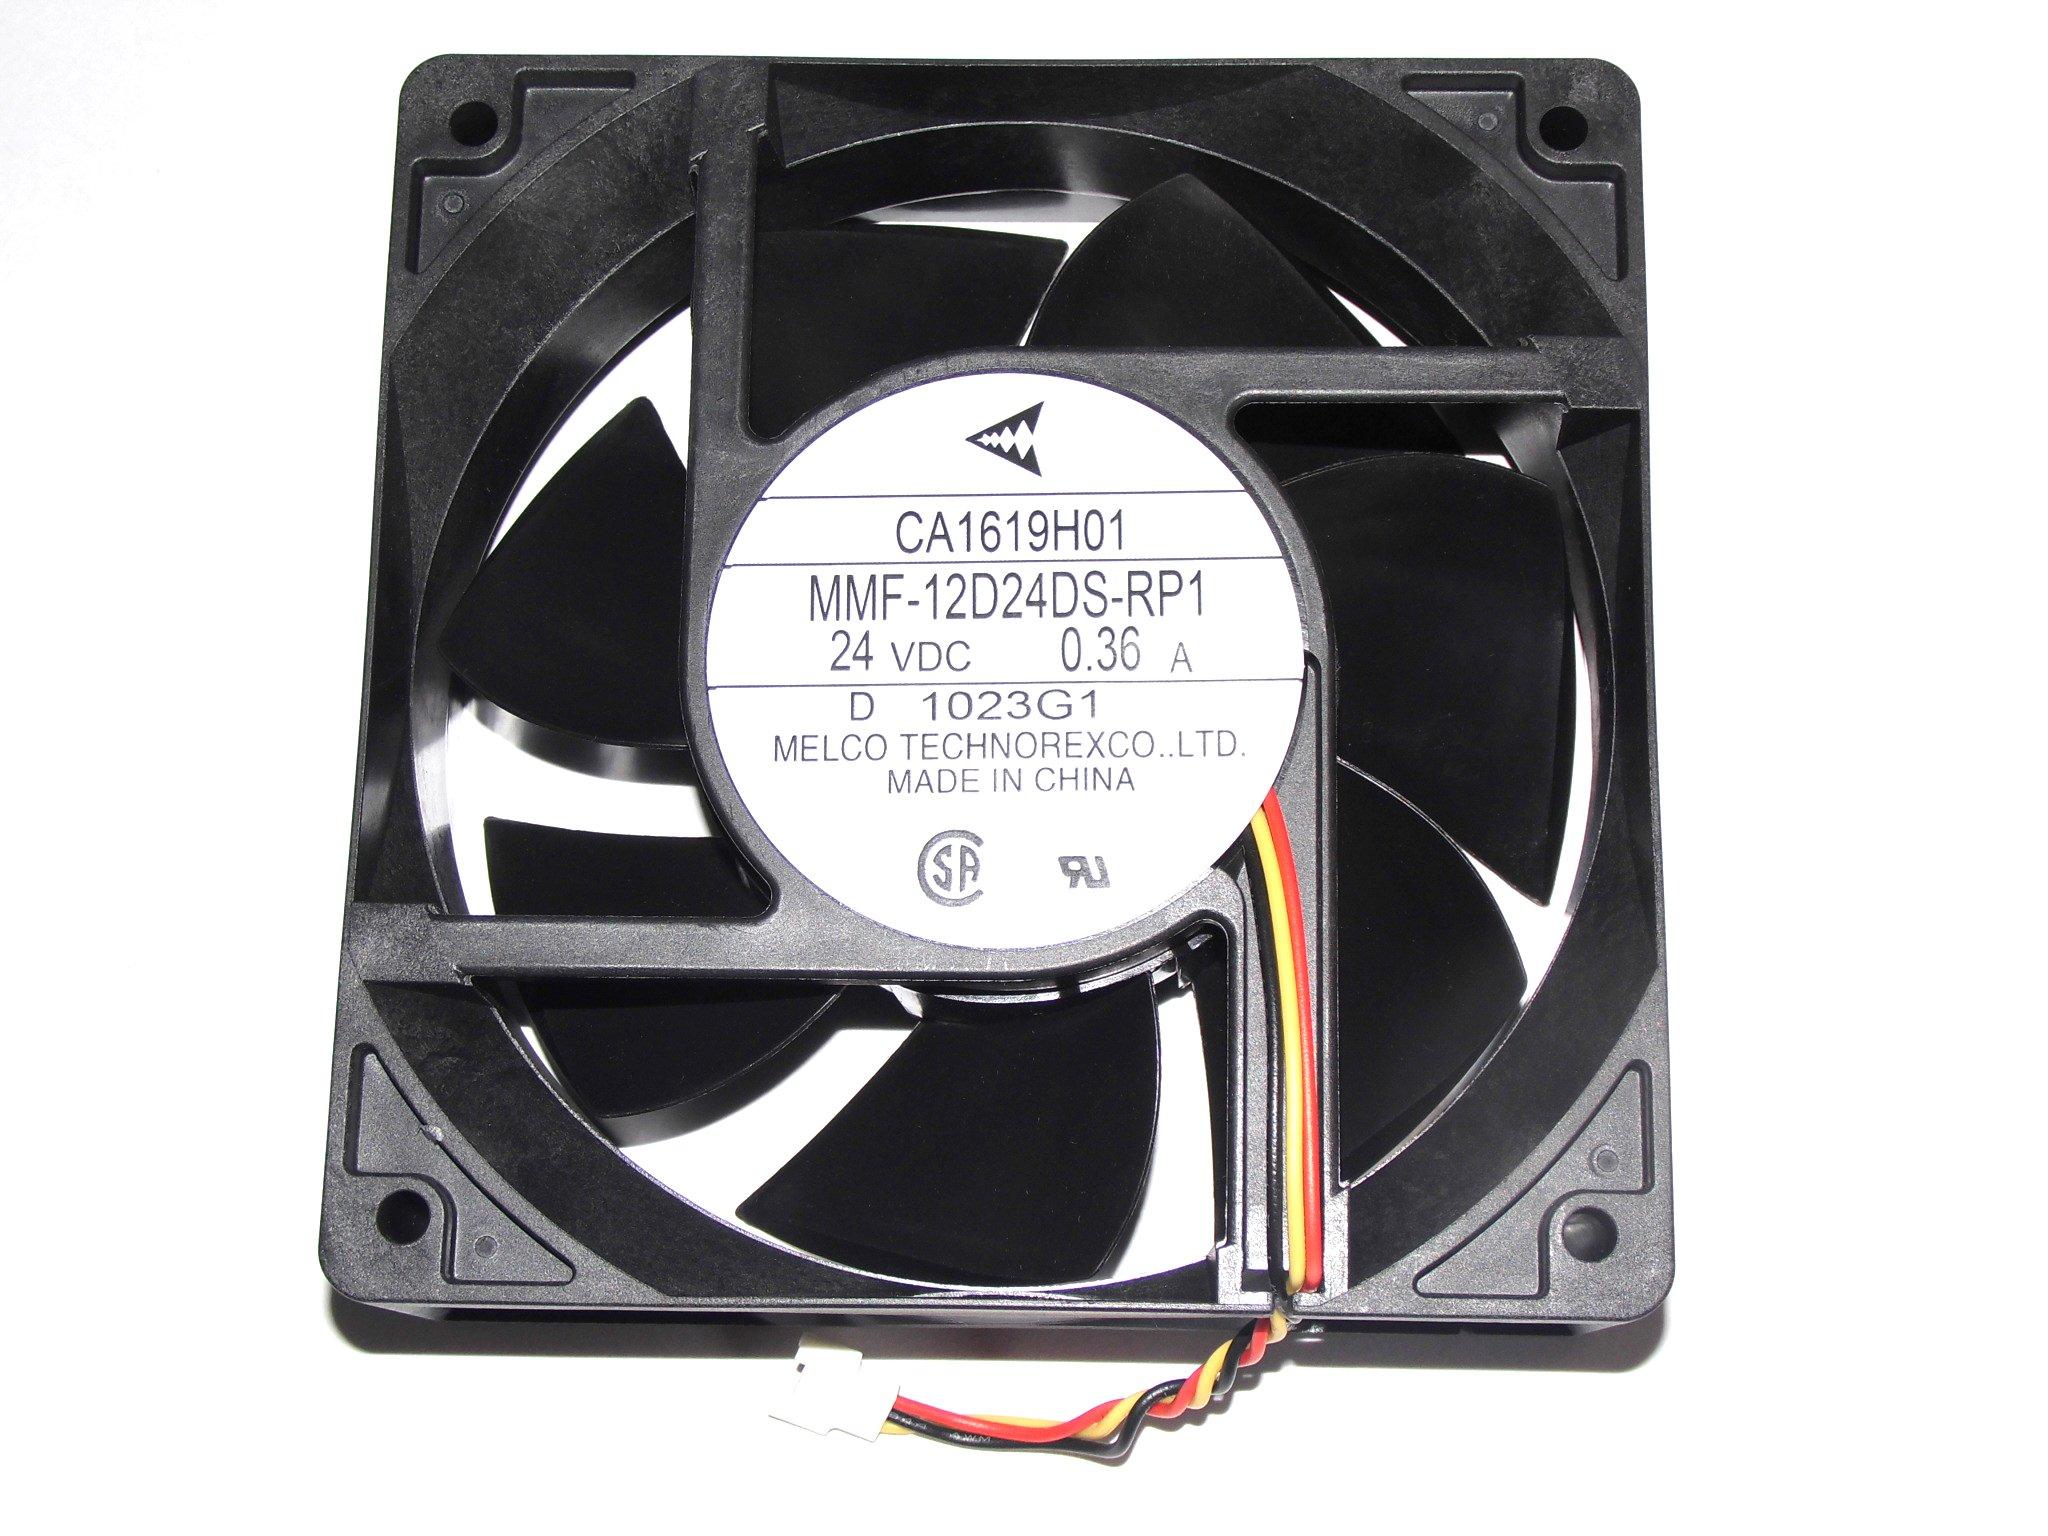 MITSUBISHI 120*38mm MMF-12D24DS-RP1 24V 0.36A CA1619H01 Server Fan,Inverter Fan,Cooling Fan